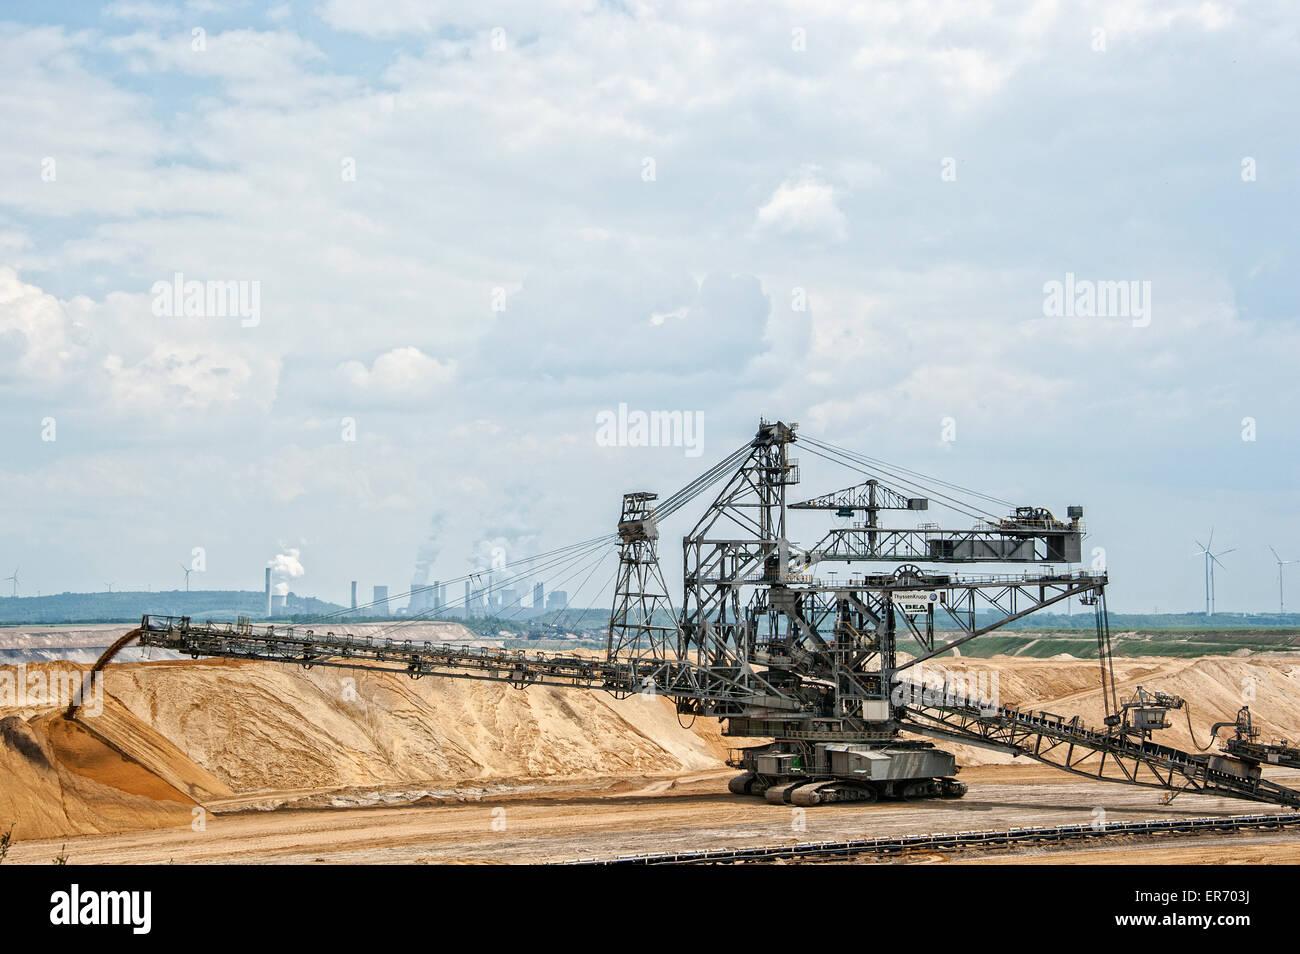 Brown coal mining Garzweiler in North Rhine Westphalia, Germany. Stock Photo